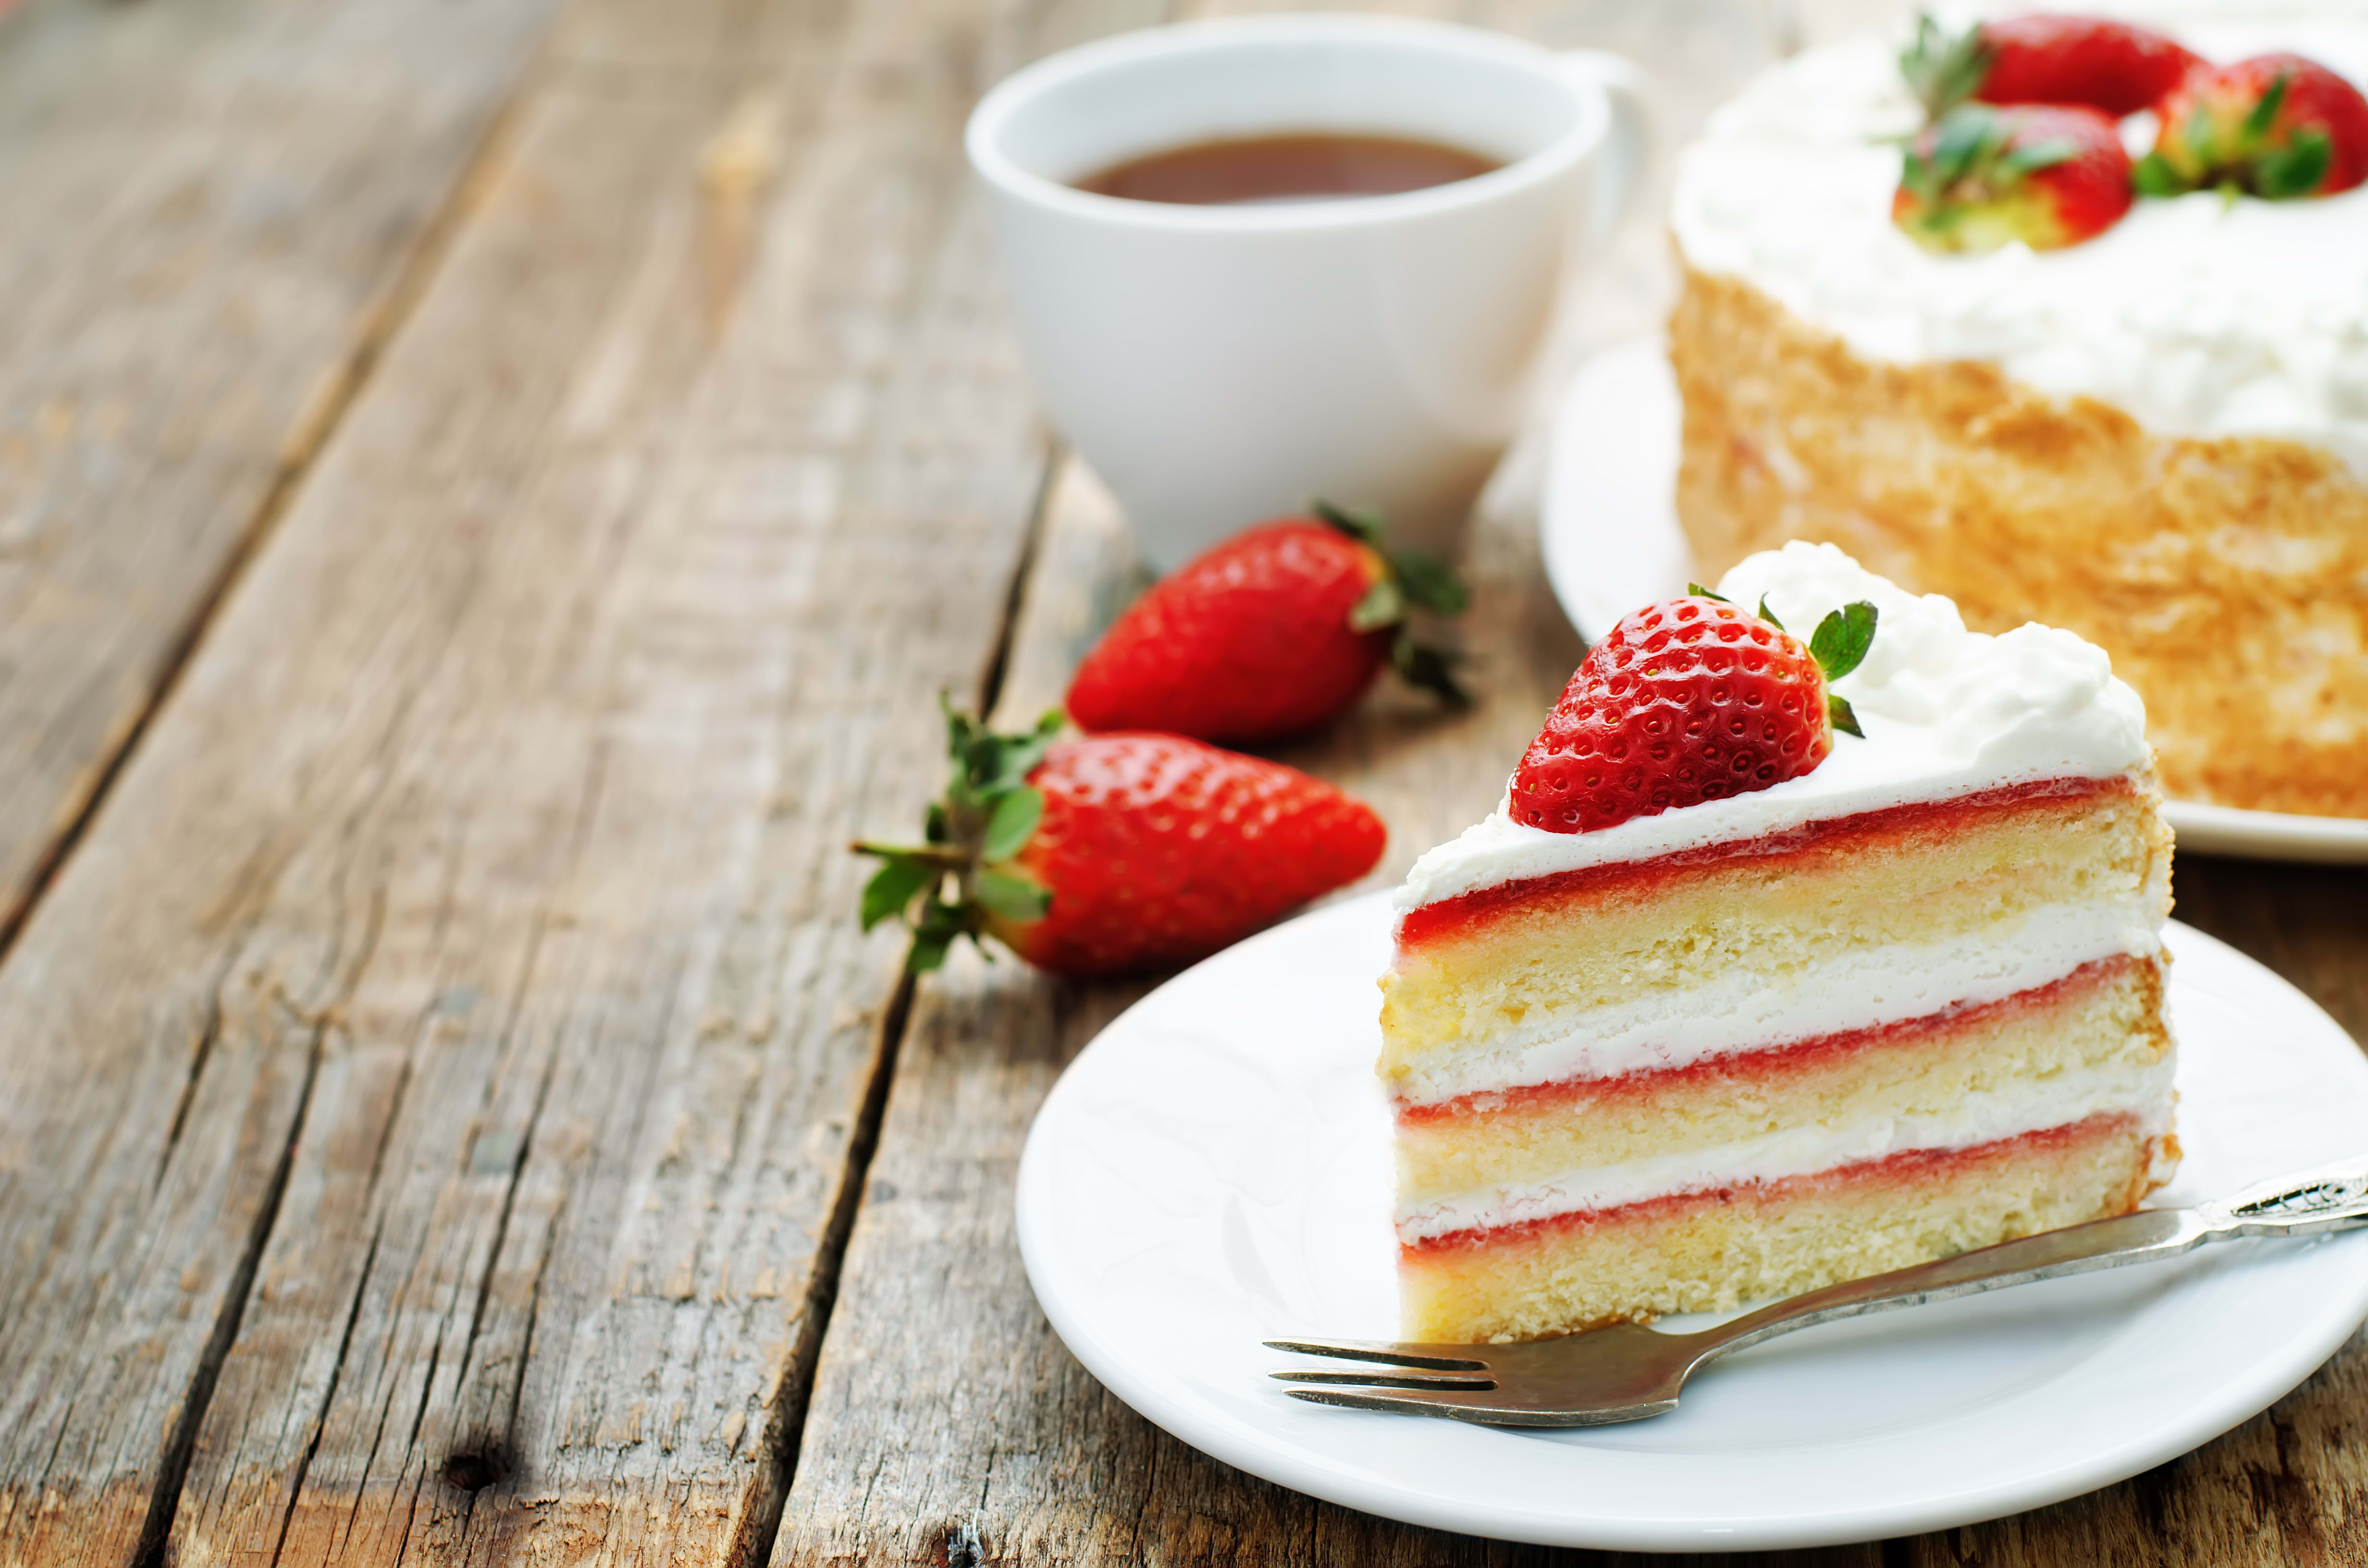 Scratch Cakes